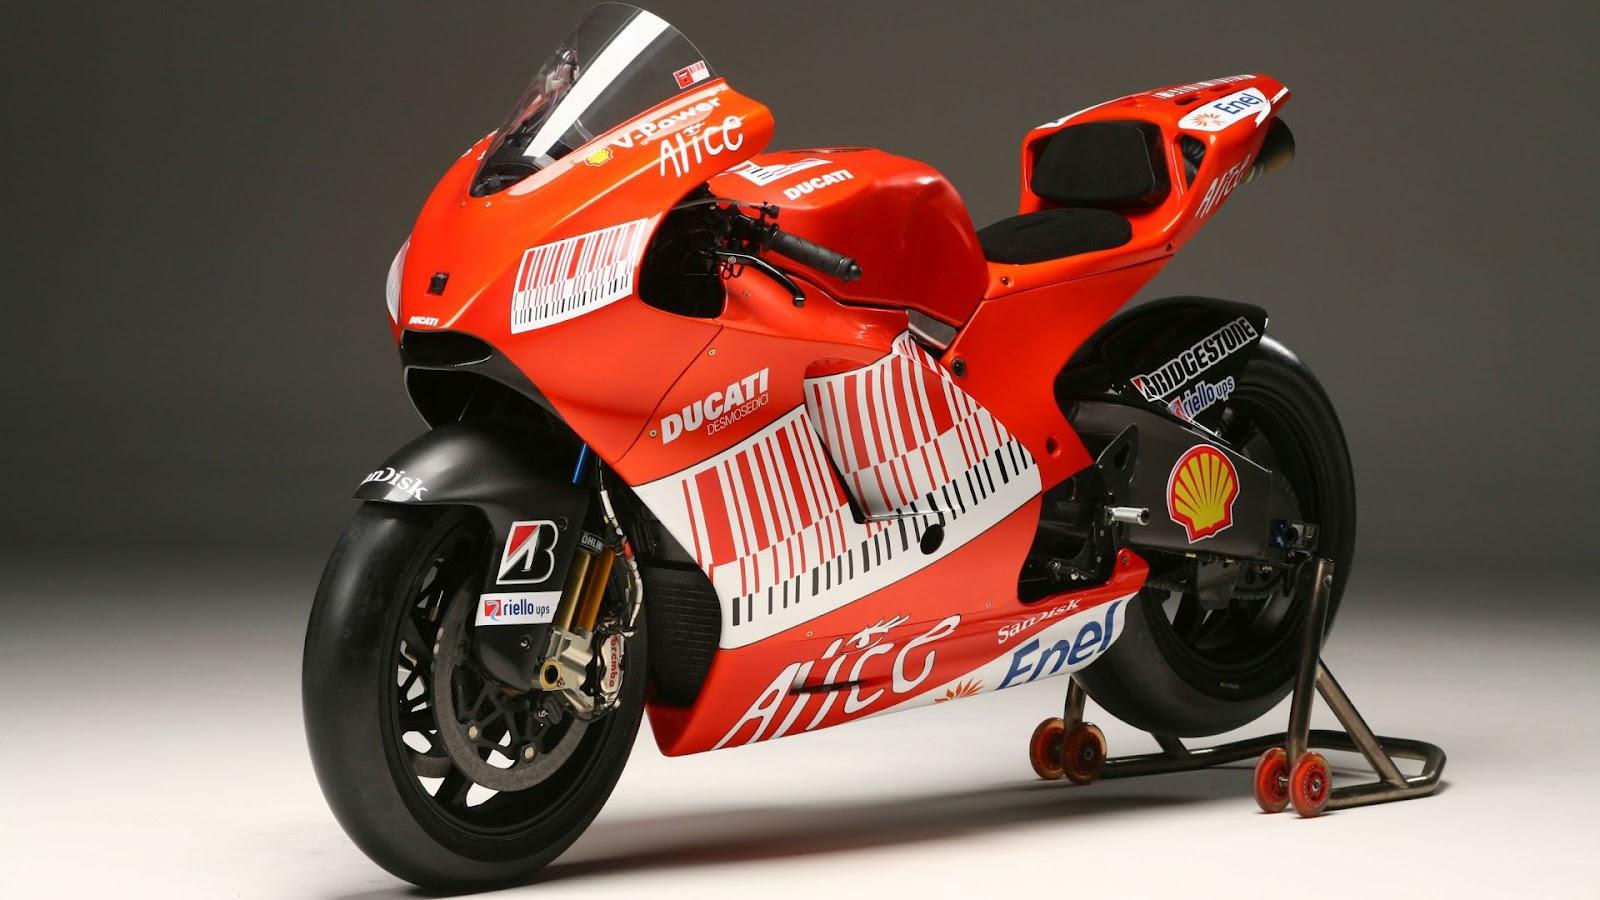 Ducati Sports Bike - Cars Wallpapers